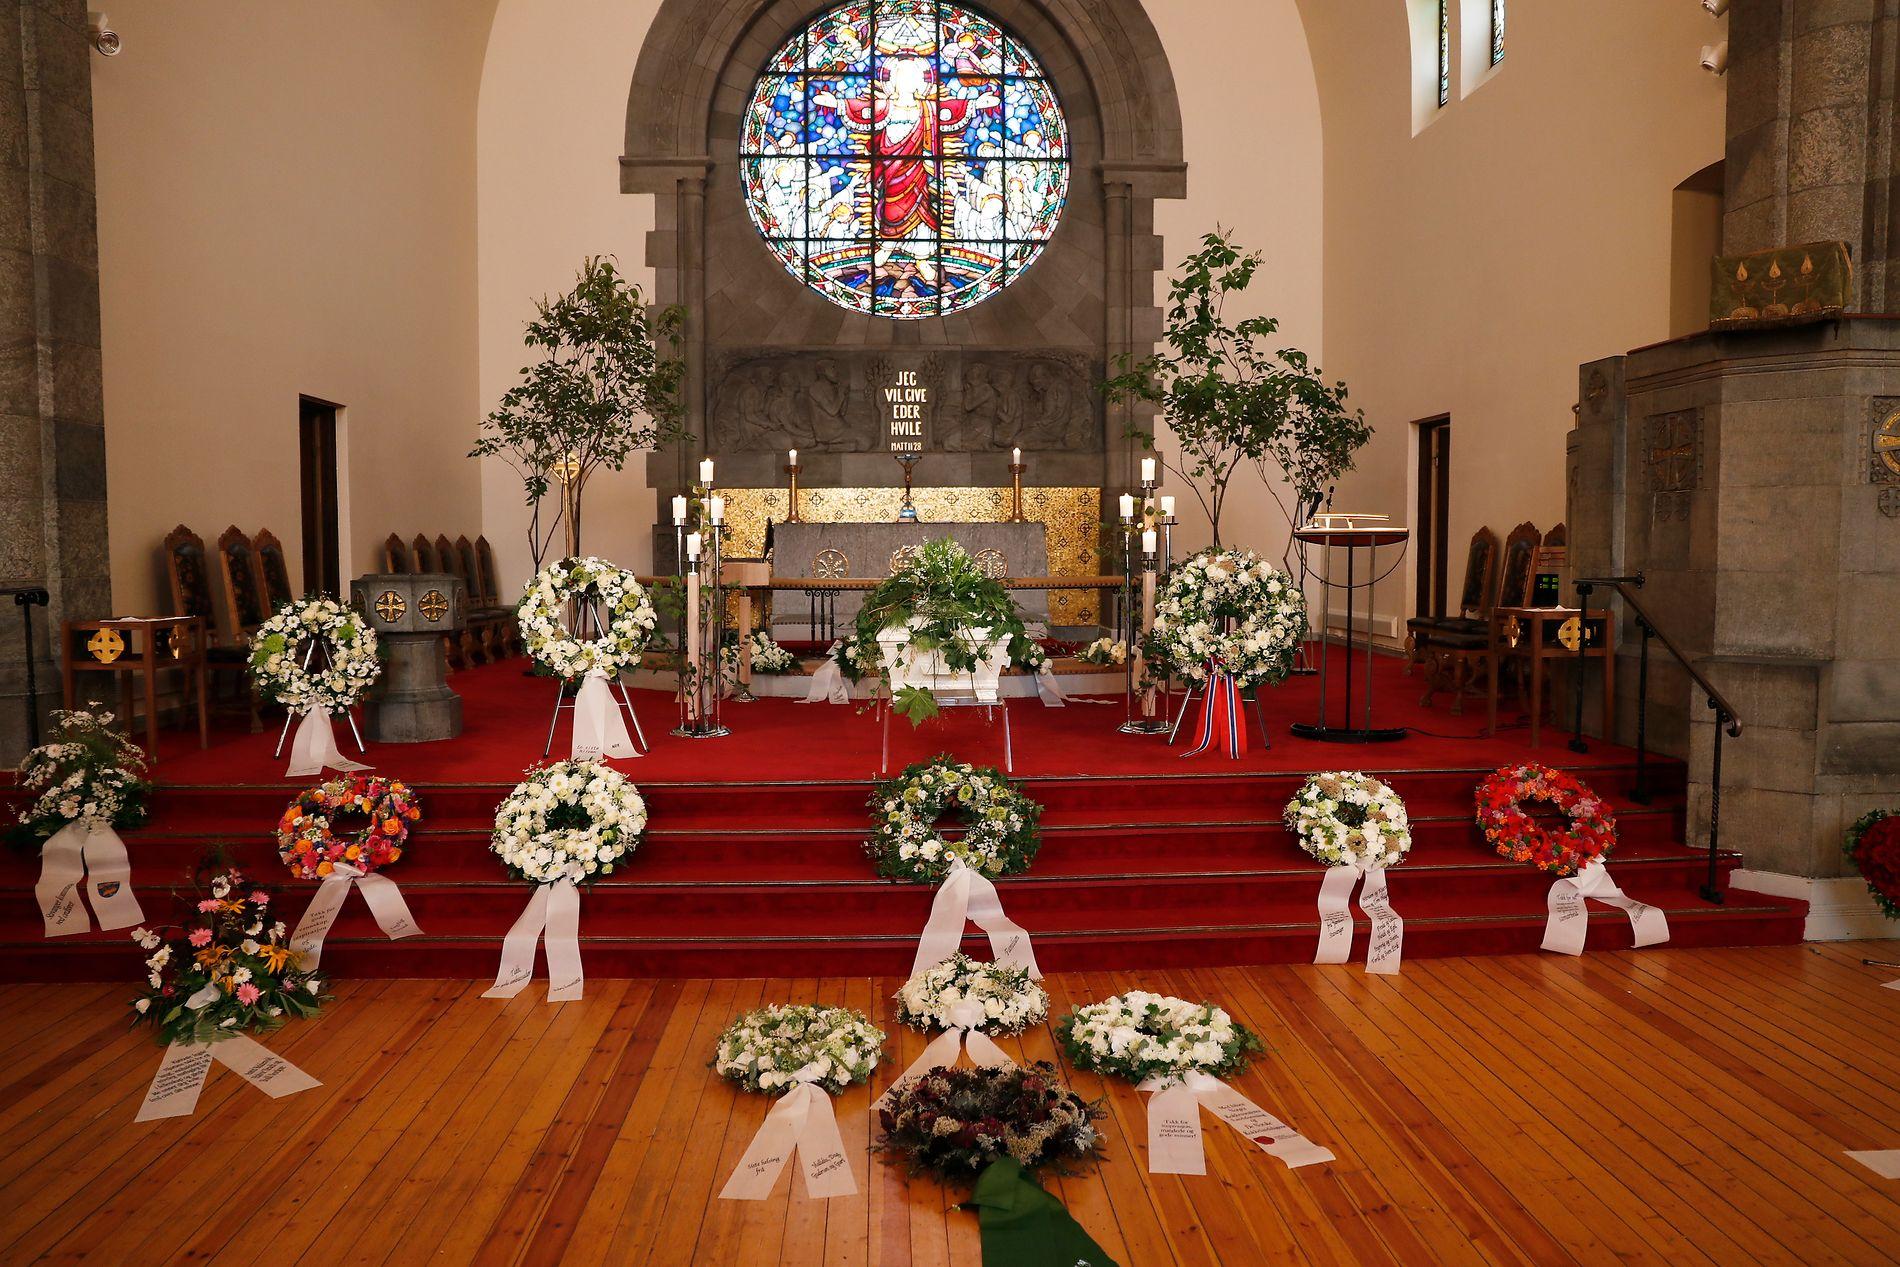 BISETTES IN FROGNER CHURCH: Ingrid Espelid Hovig was 94 years old.